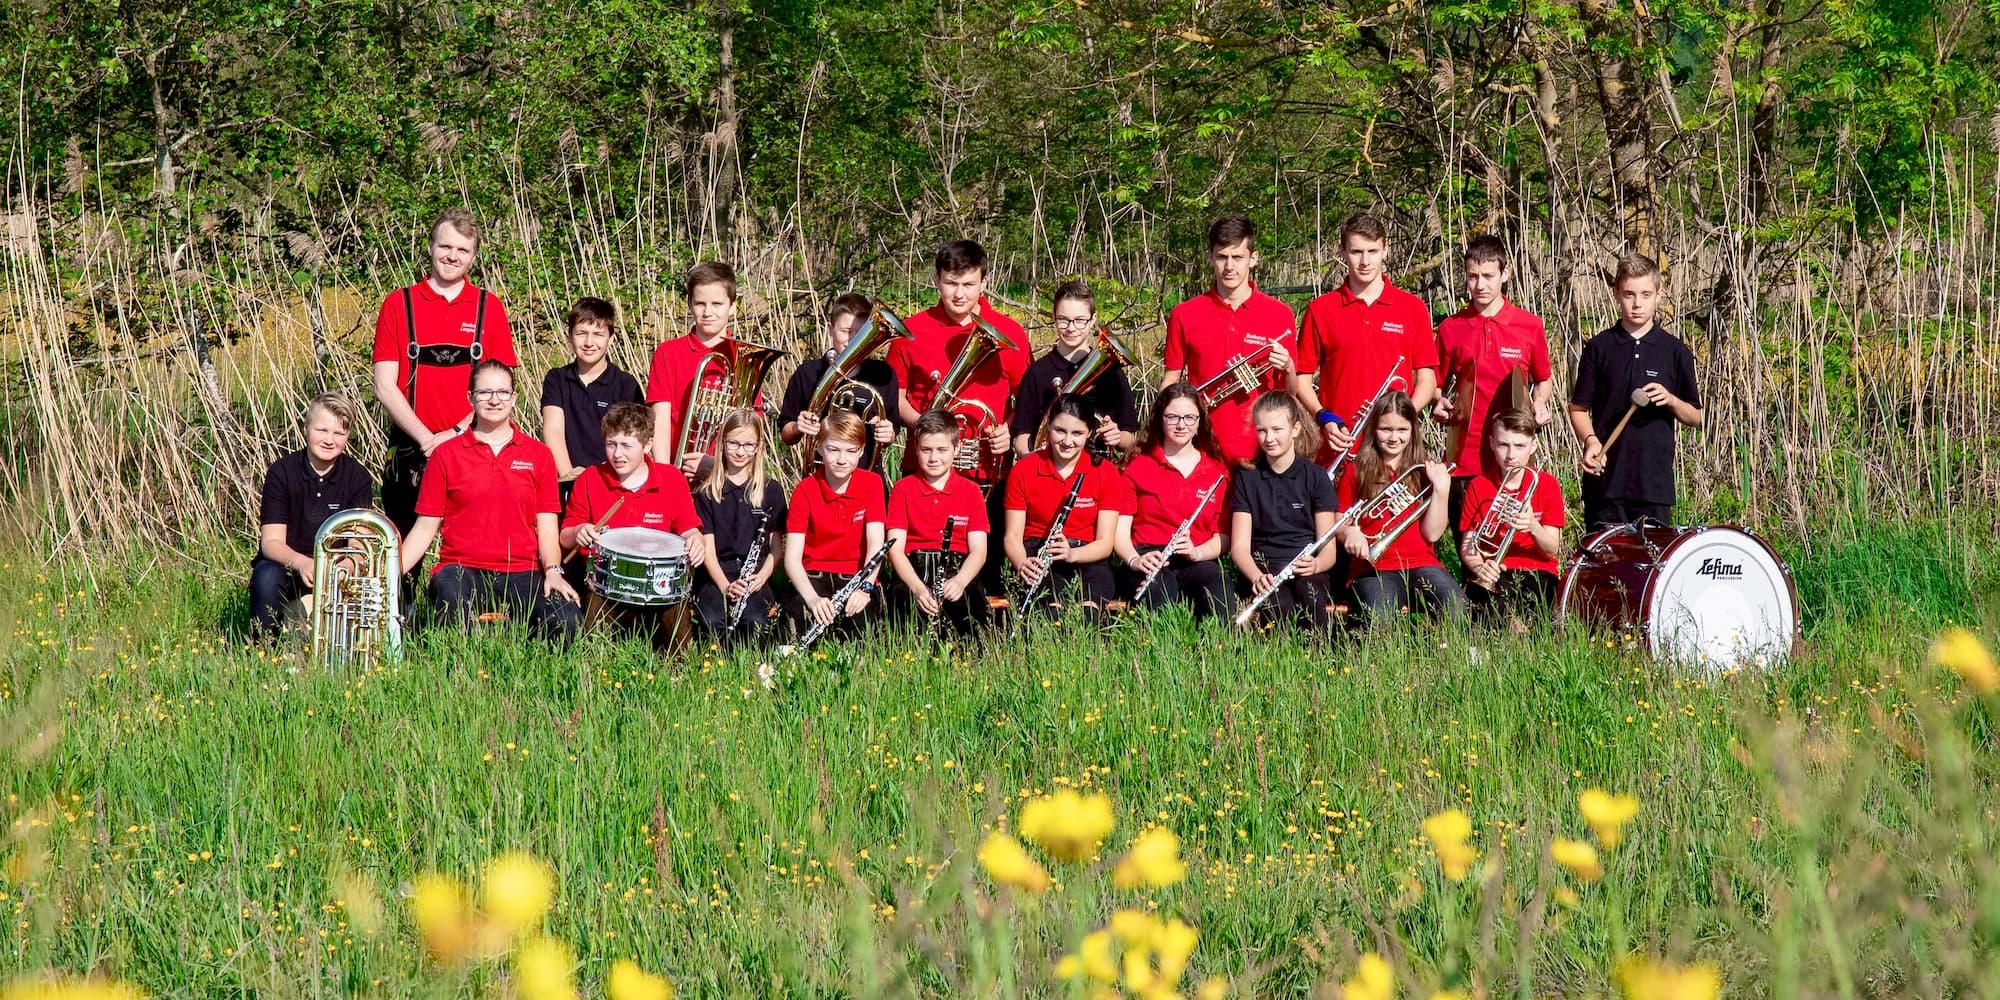 Jugendblasorchester Biberbach & Langweid